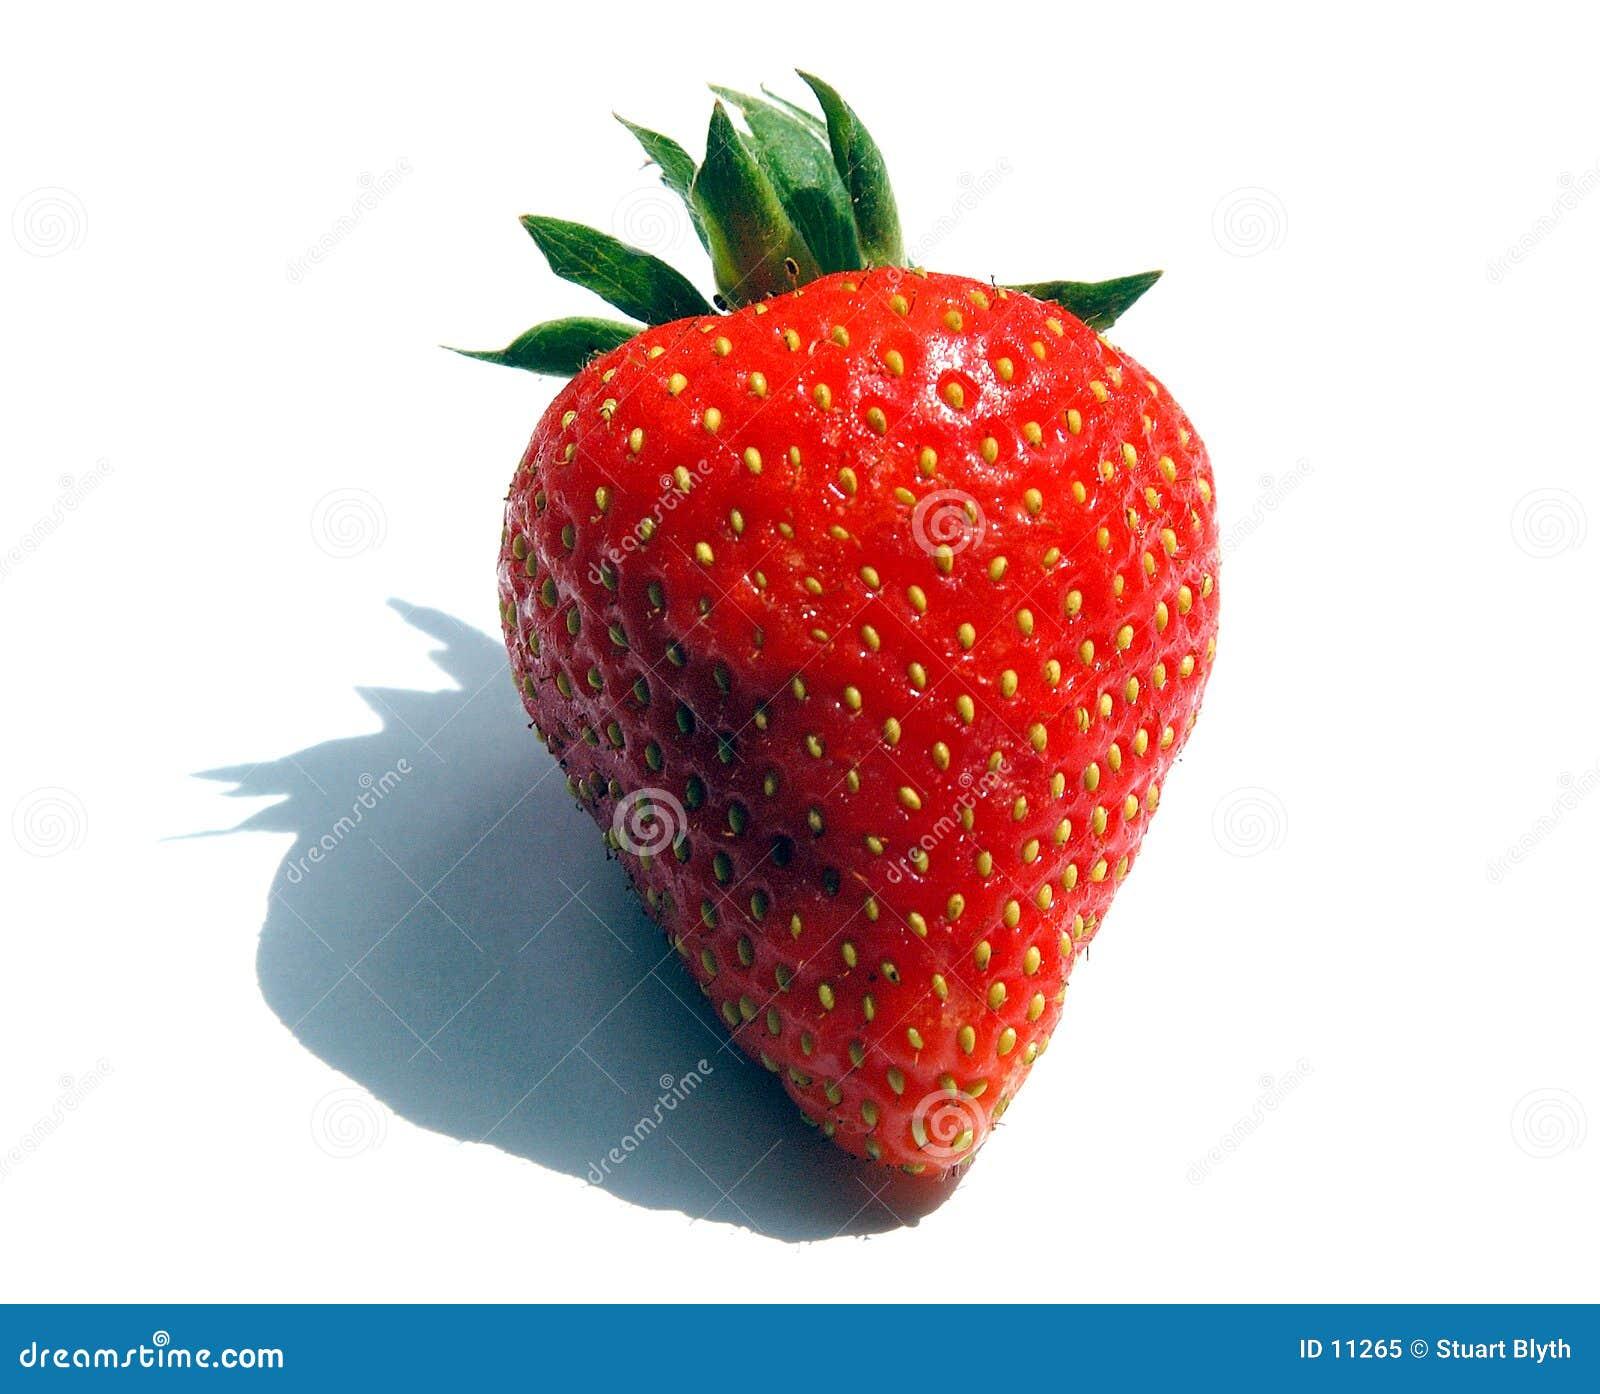 Last Strawberry